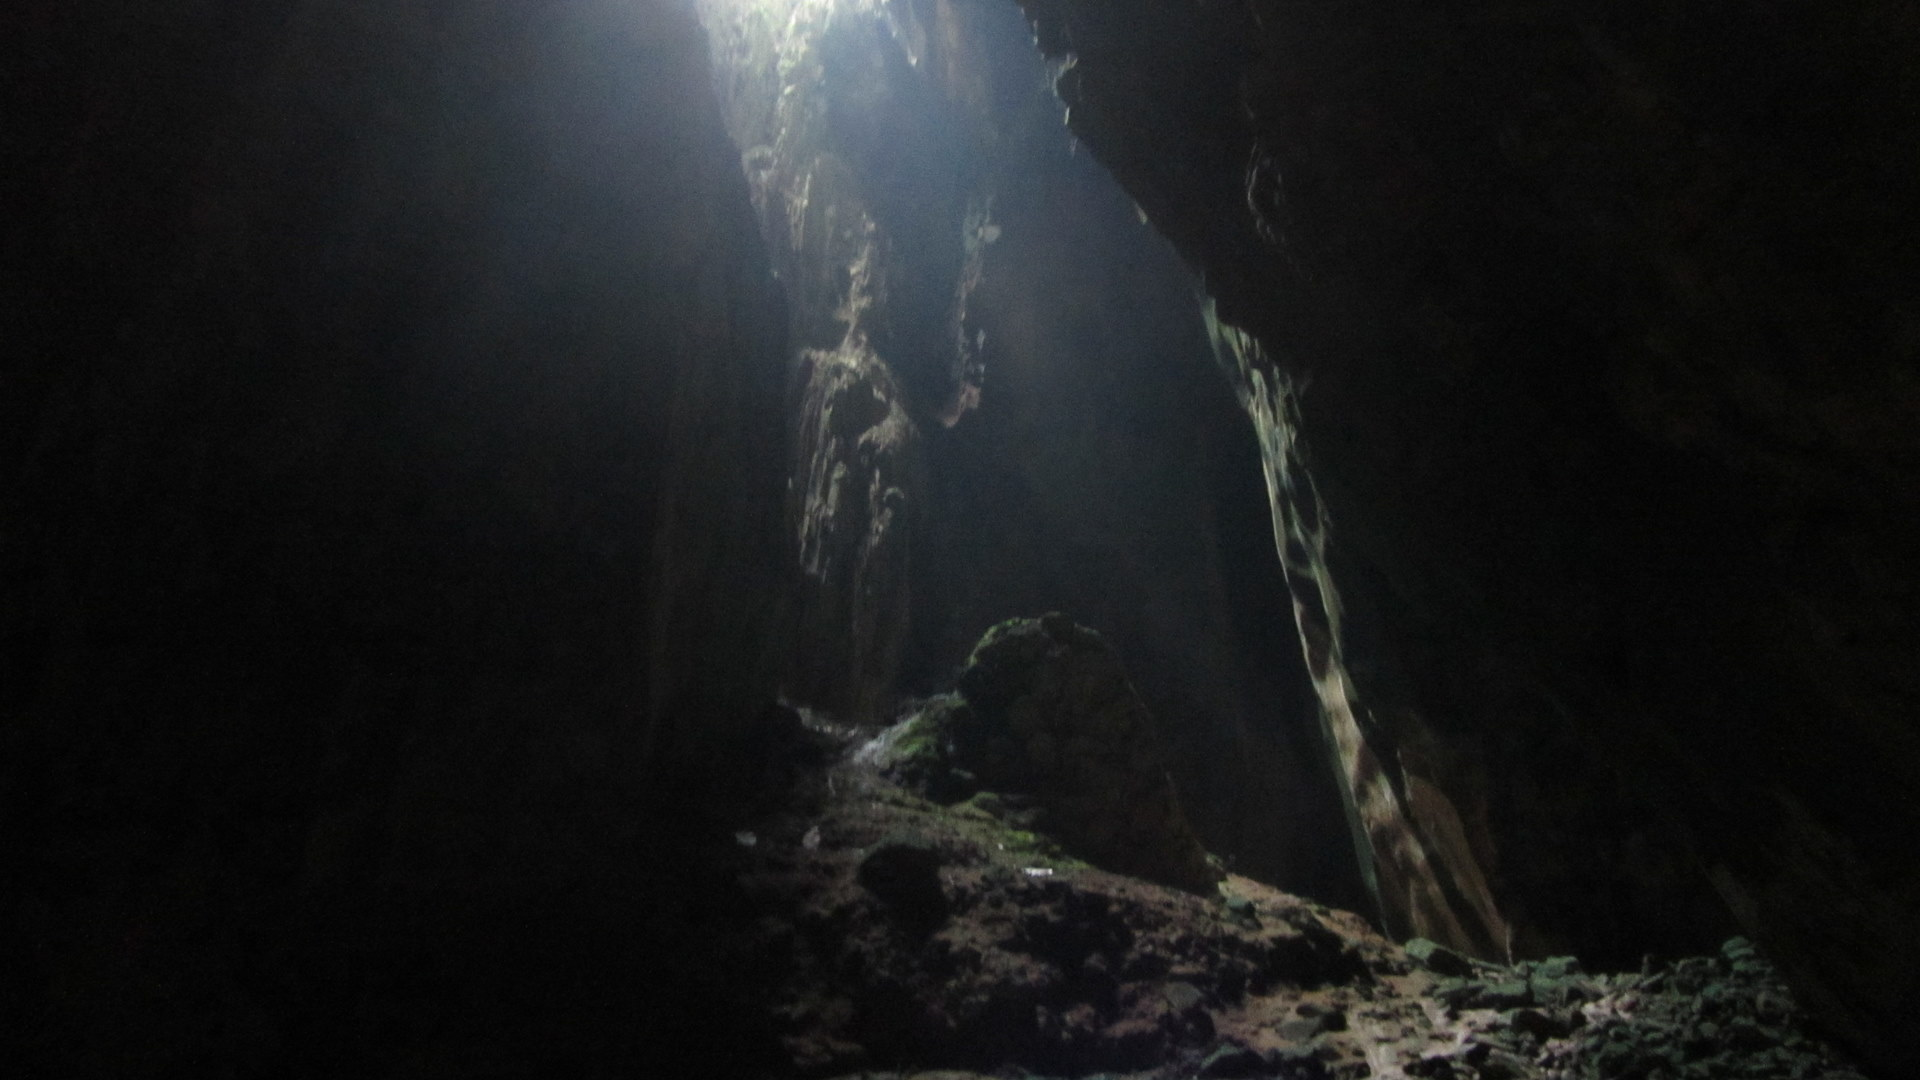 Blood Money Wallpaper Hd The Batu Caves Pearce On Earth